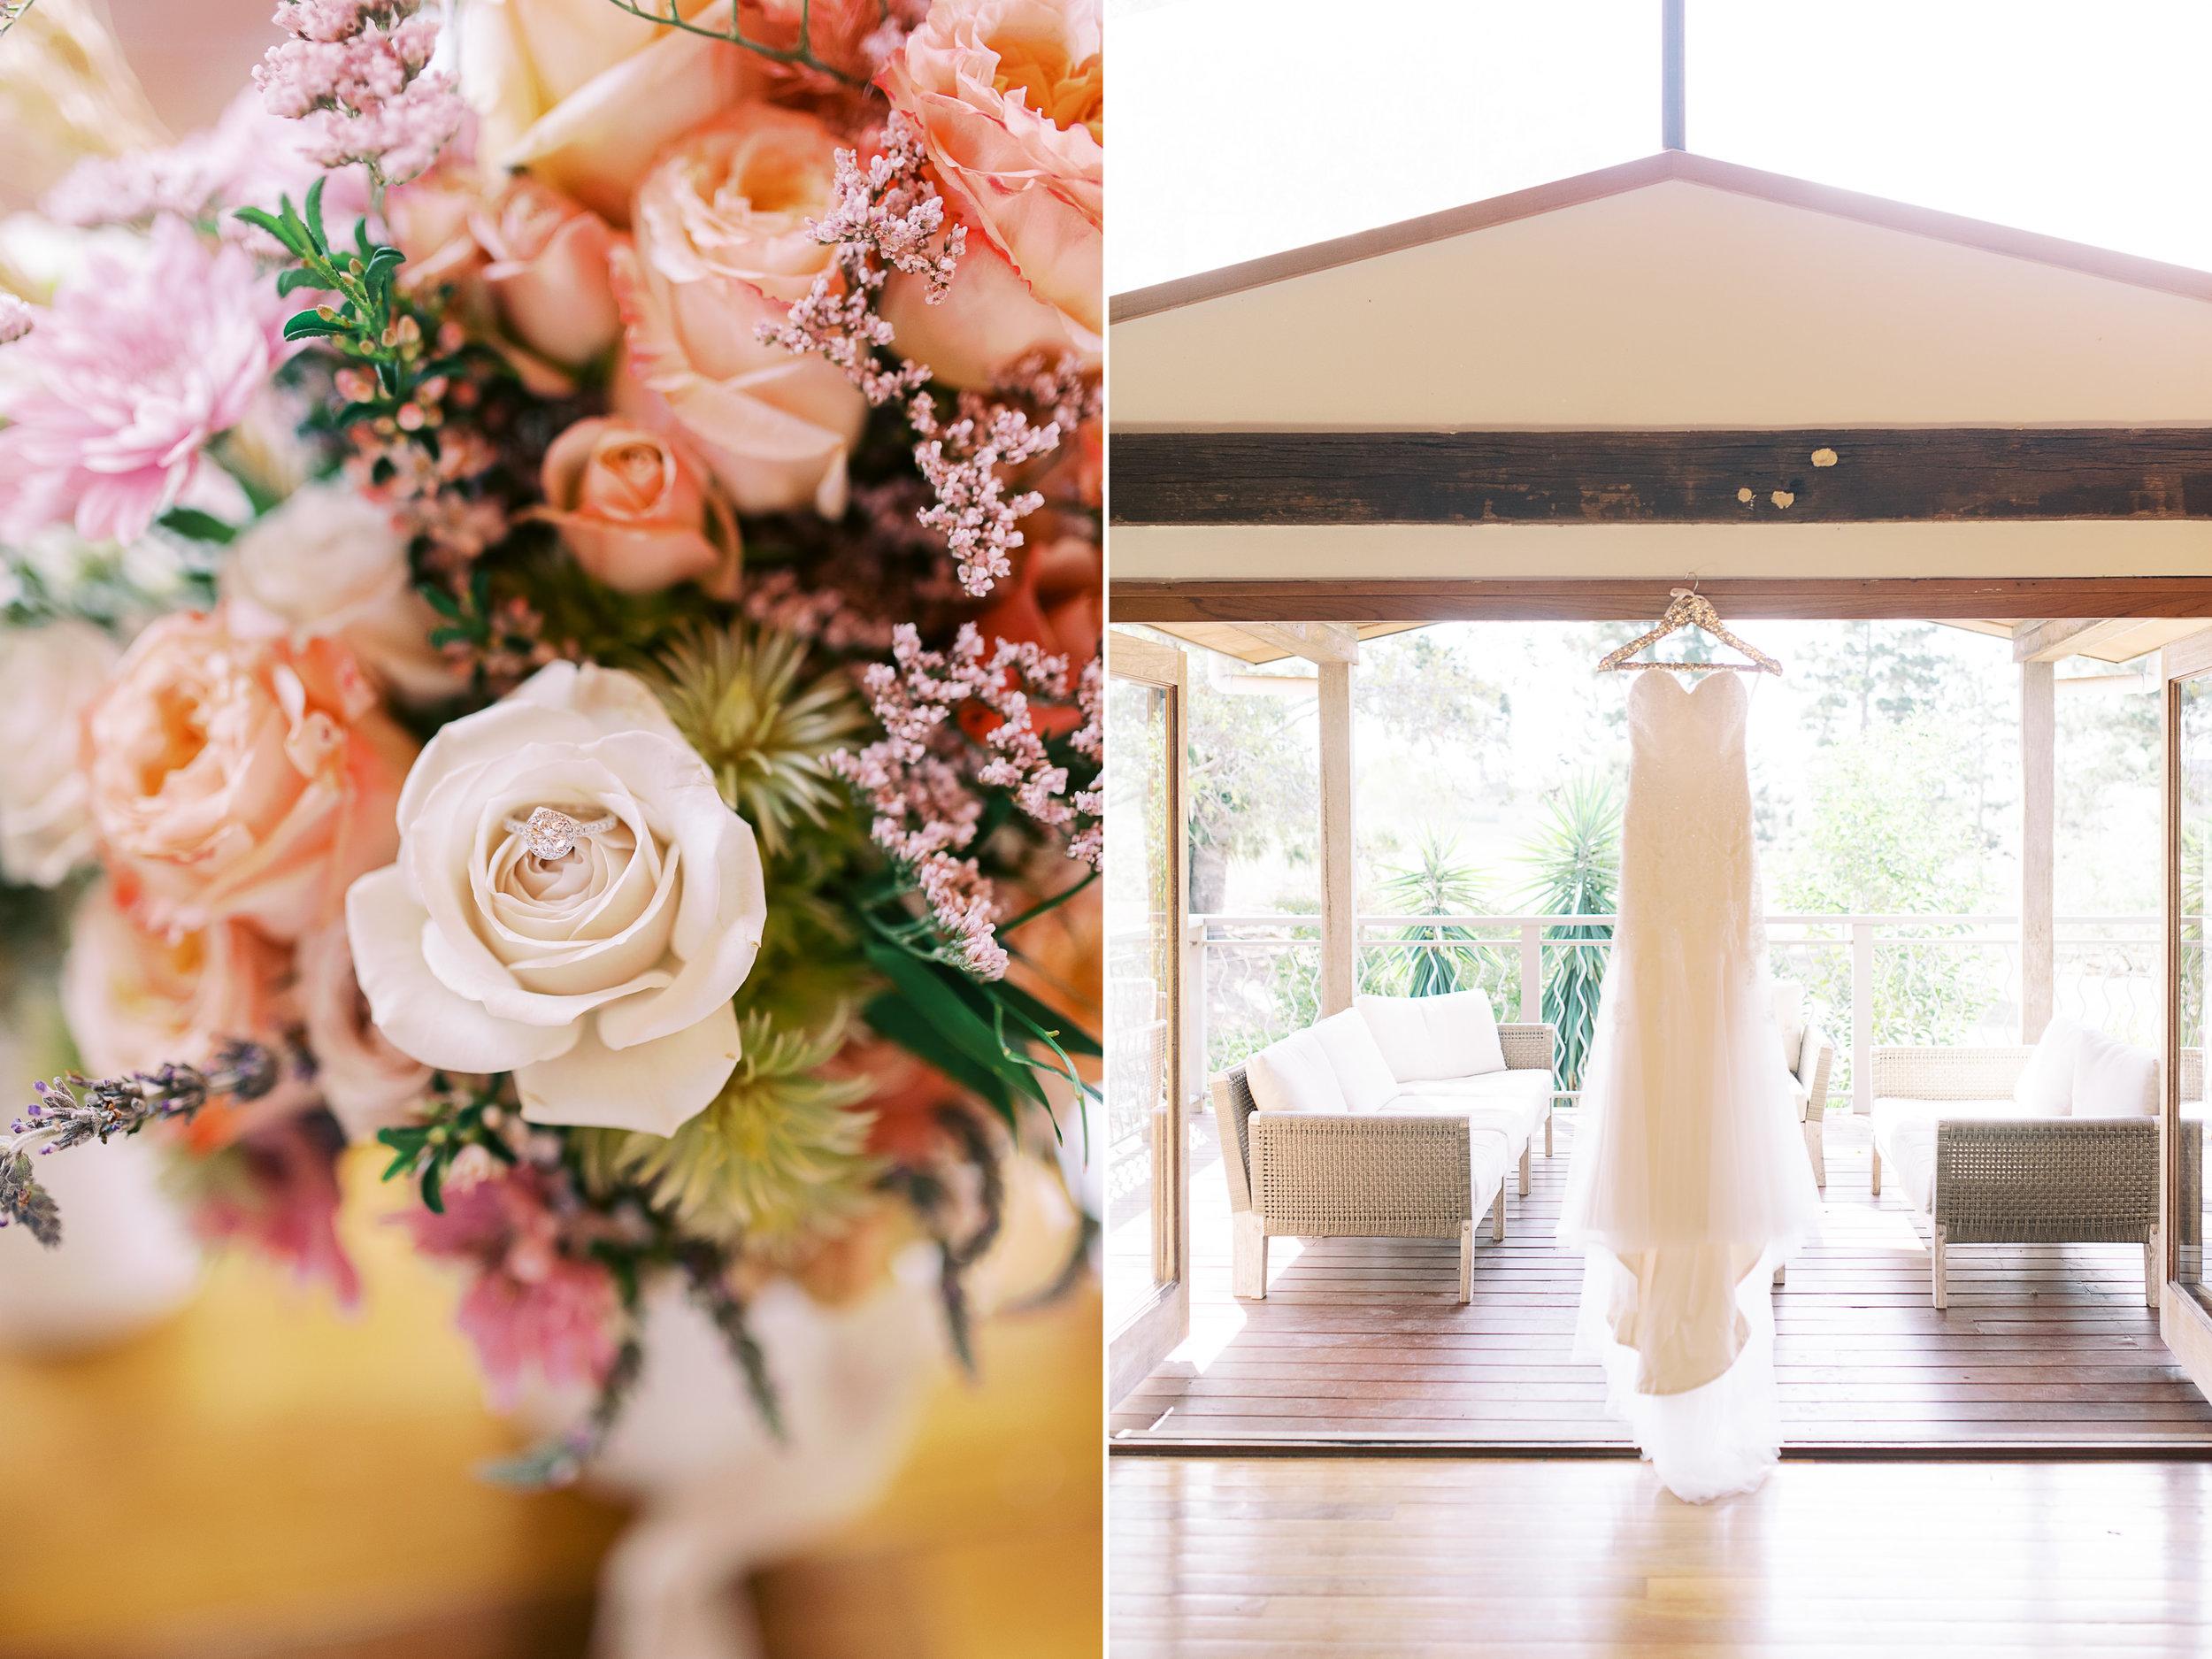 kooroomba-lavendar-farm-film-photography-wedding-photography-romantic-02.jpg